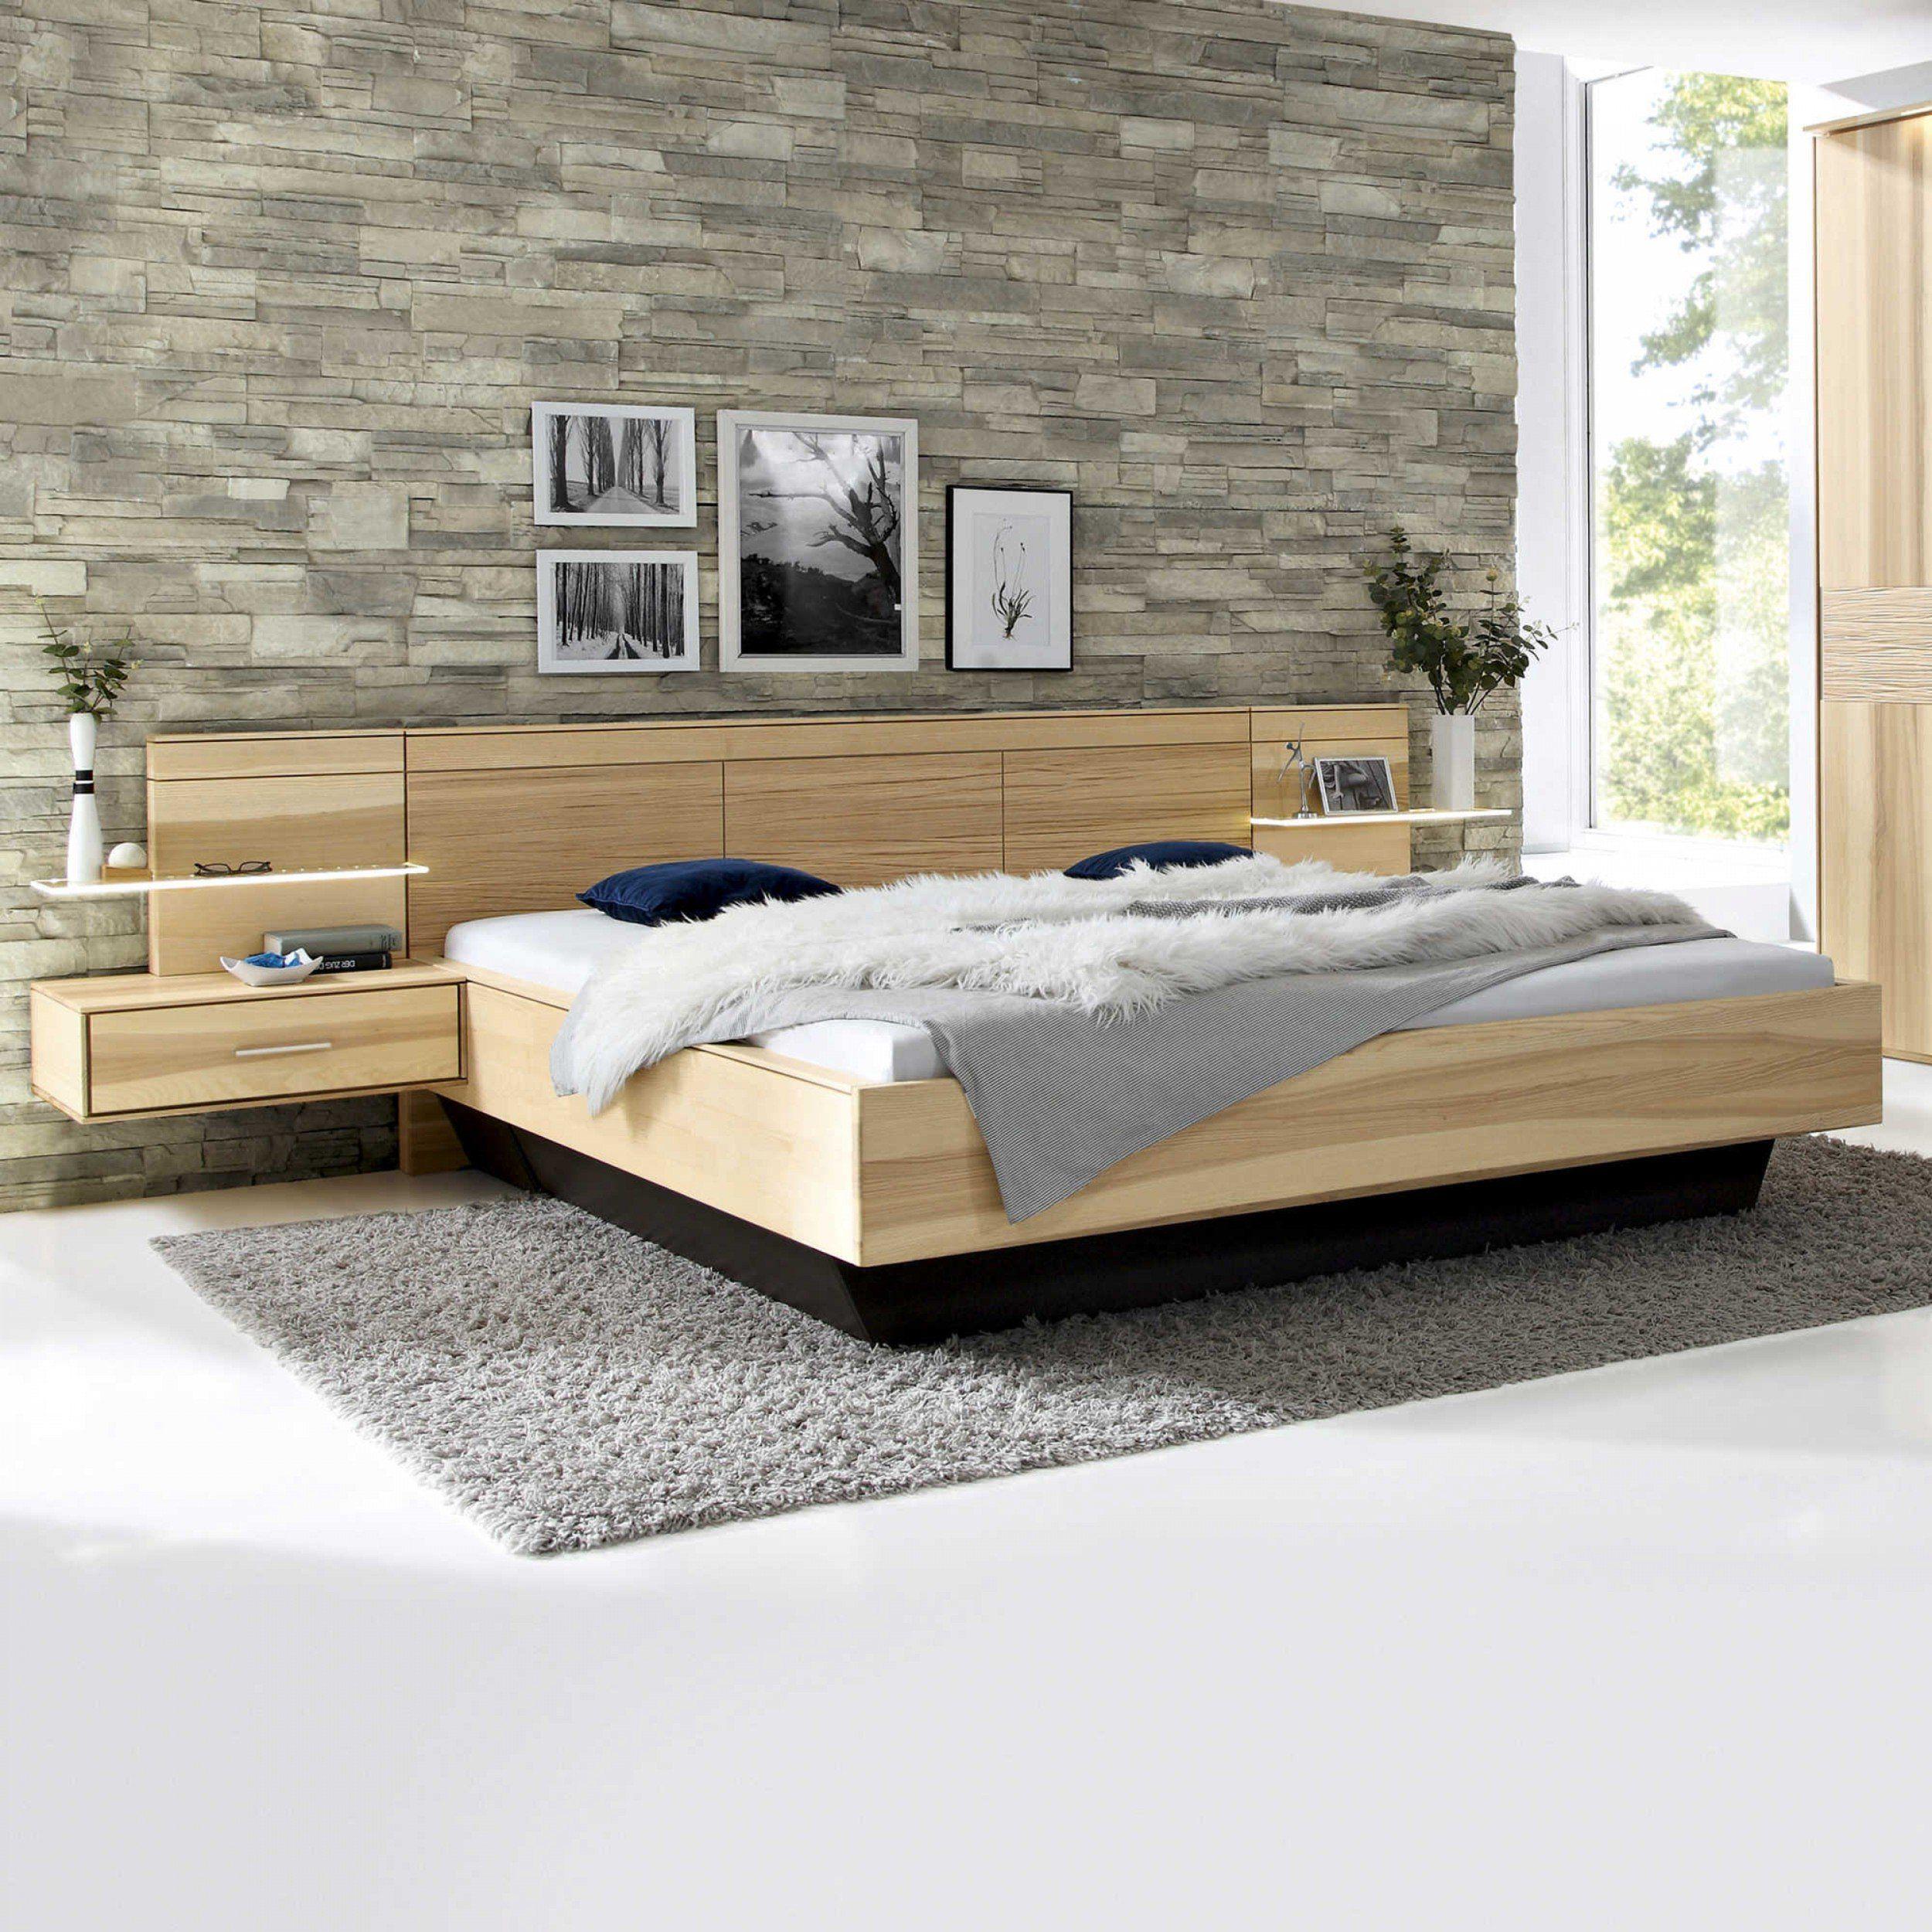 Thielemeyer Bett Mit Nachttischen Mira 4 0 180 X 200 Cm Massivholzbetten Betten Schlafzimmer Mobel Bett Ideen Bett Modern Schlafzimmer Design